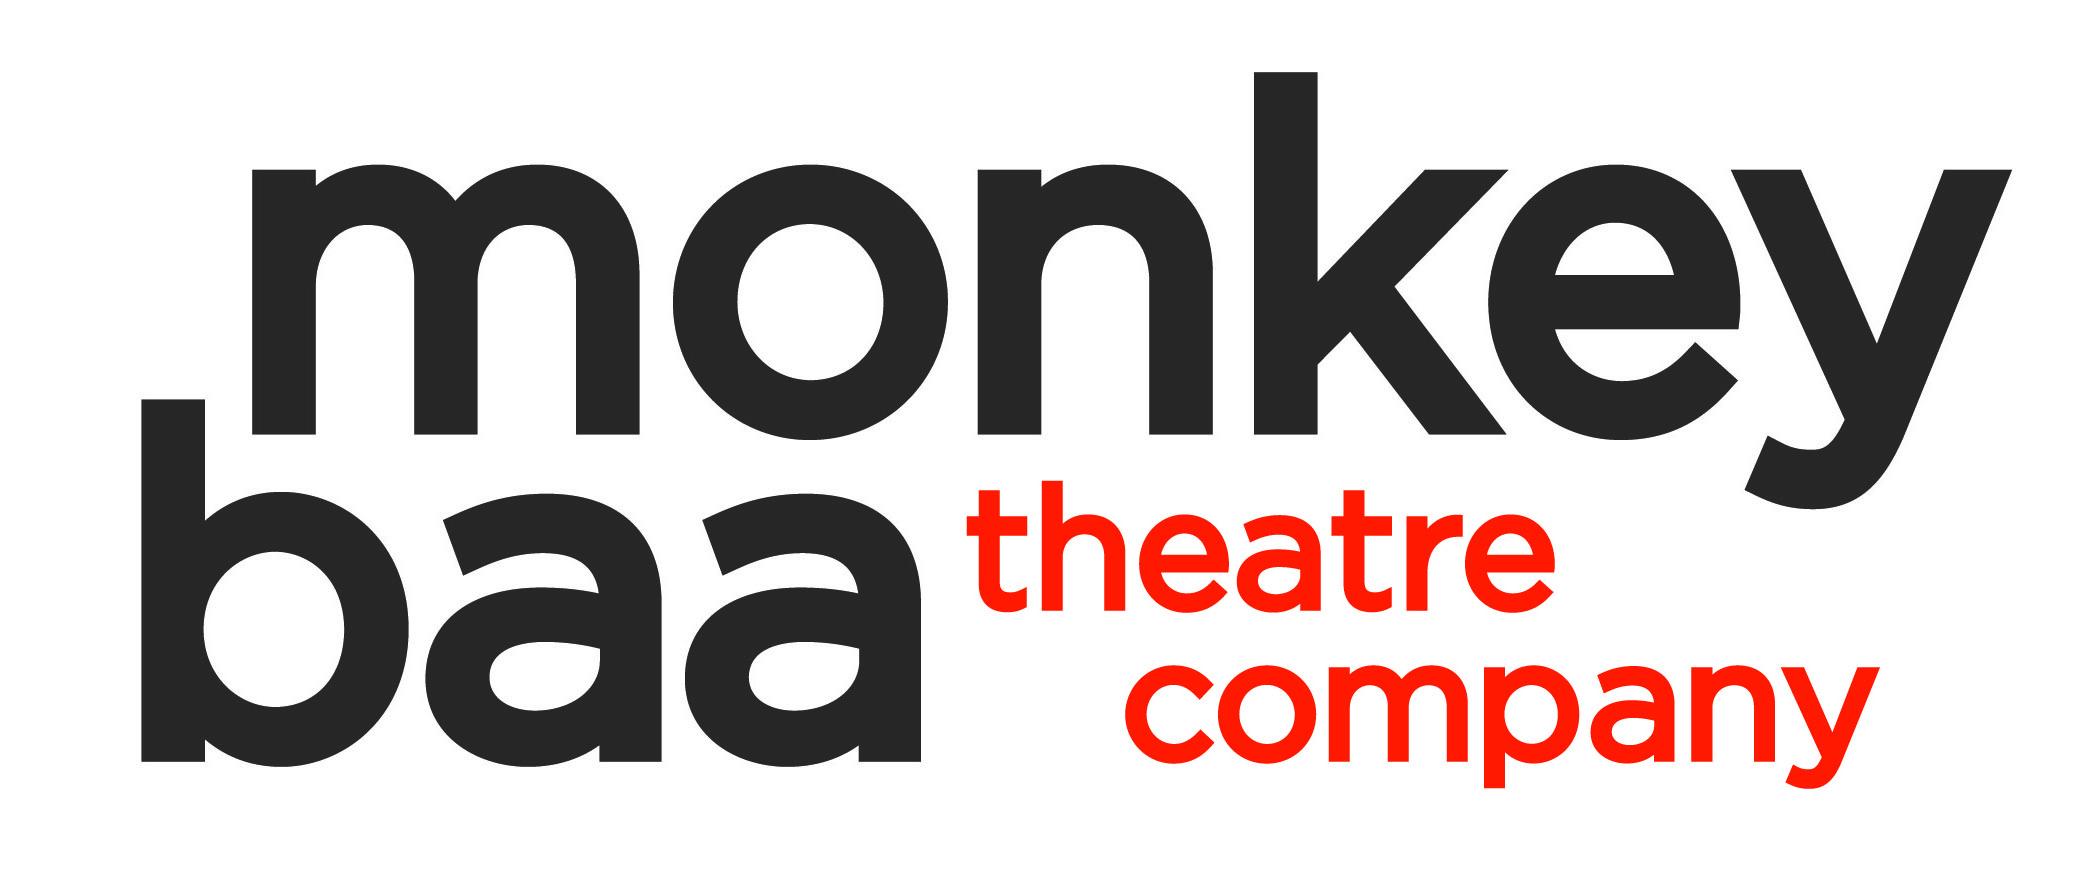 Student education program with Monkey Baa Theatre